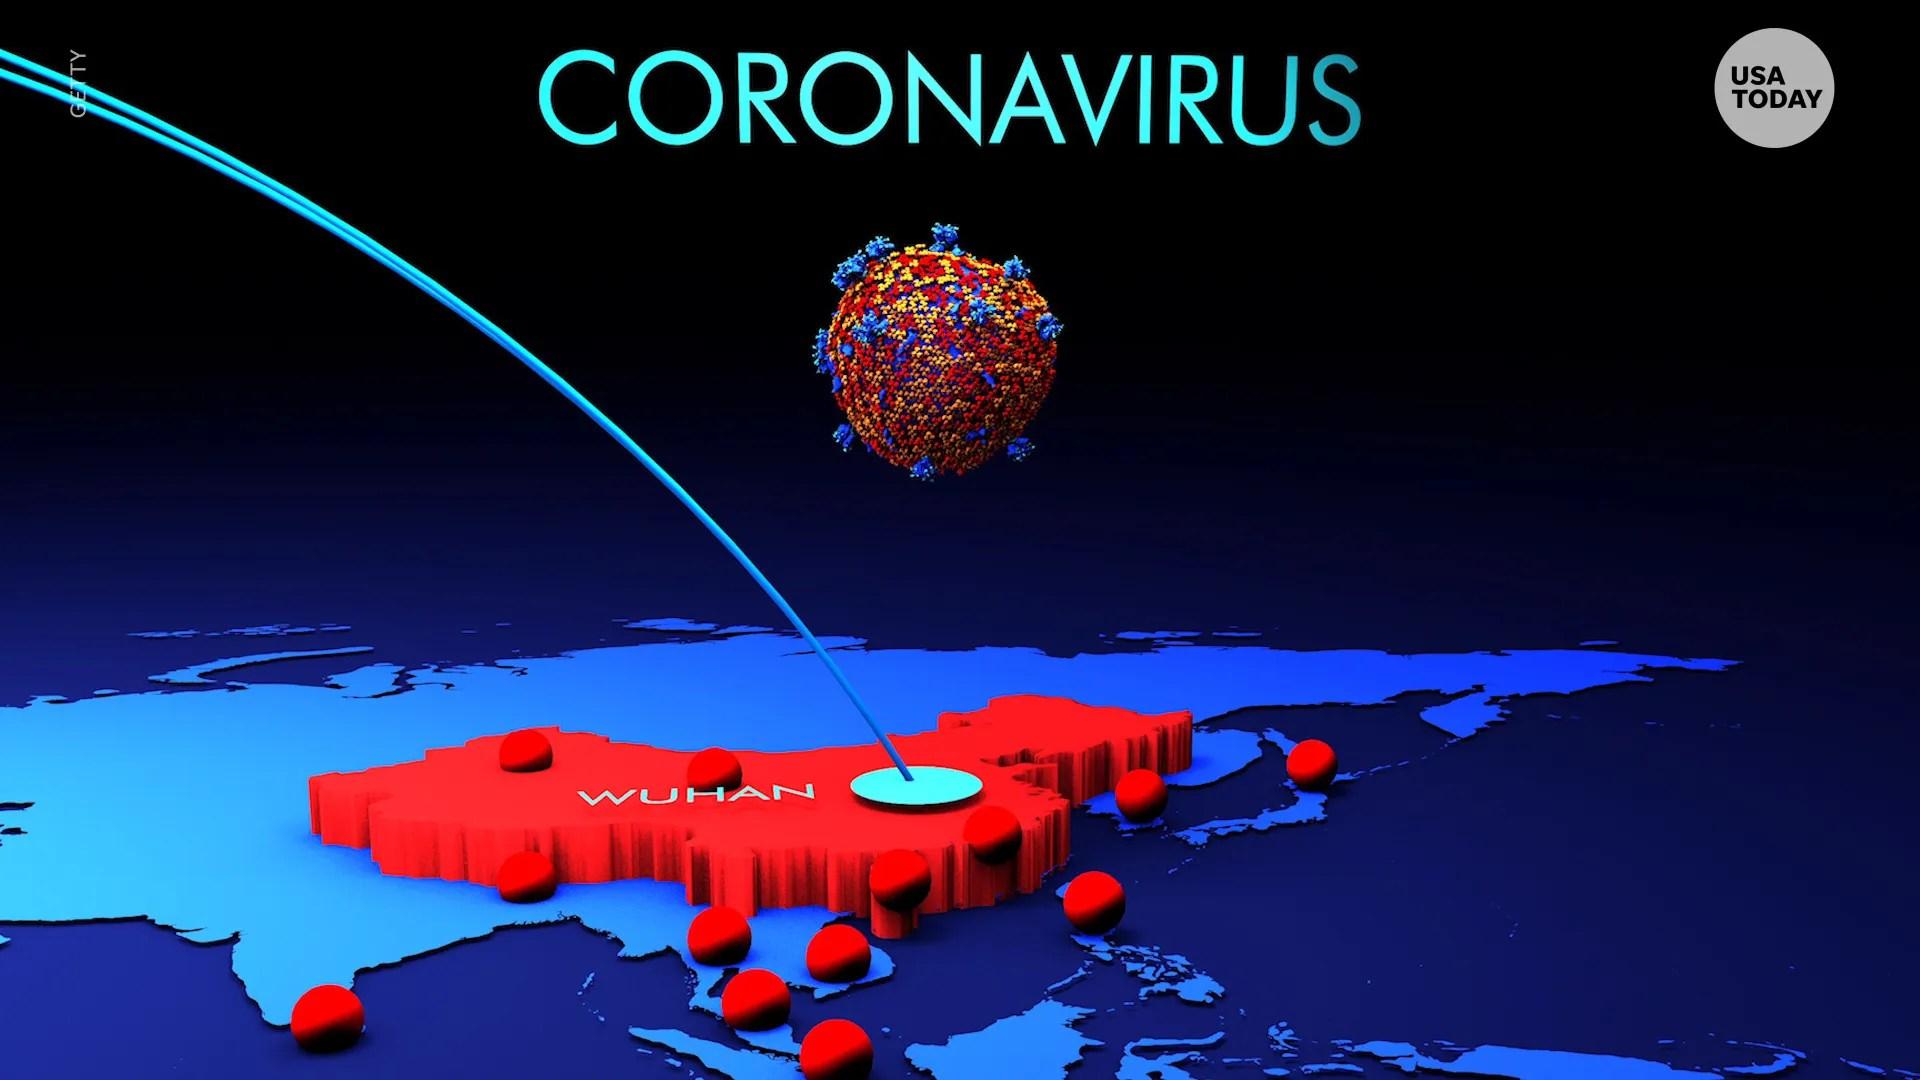 Coronavirus tracked across the US and world